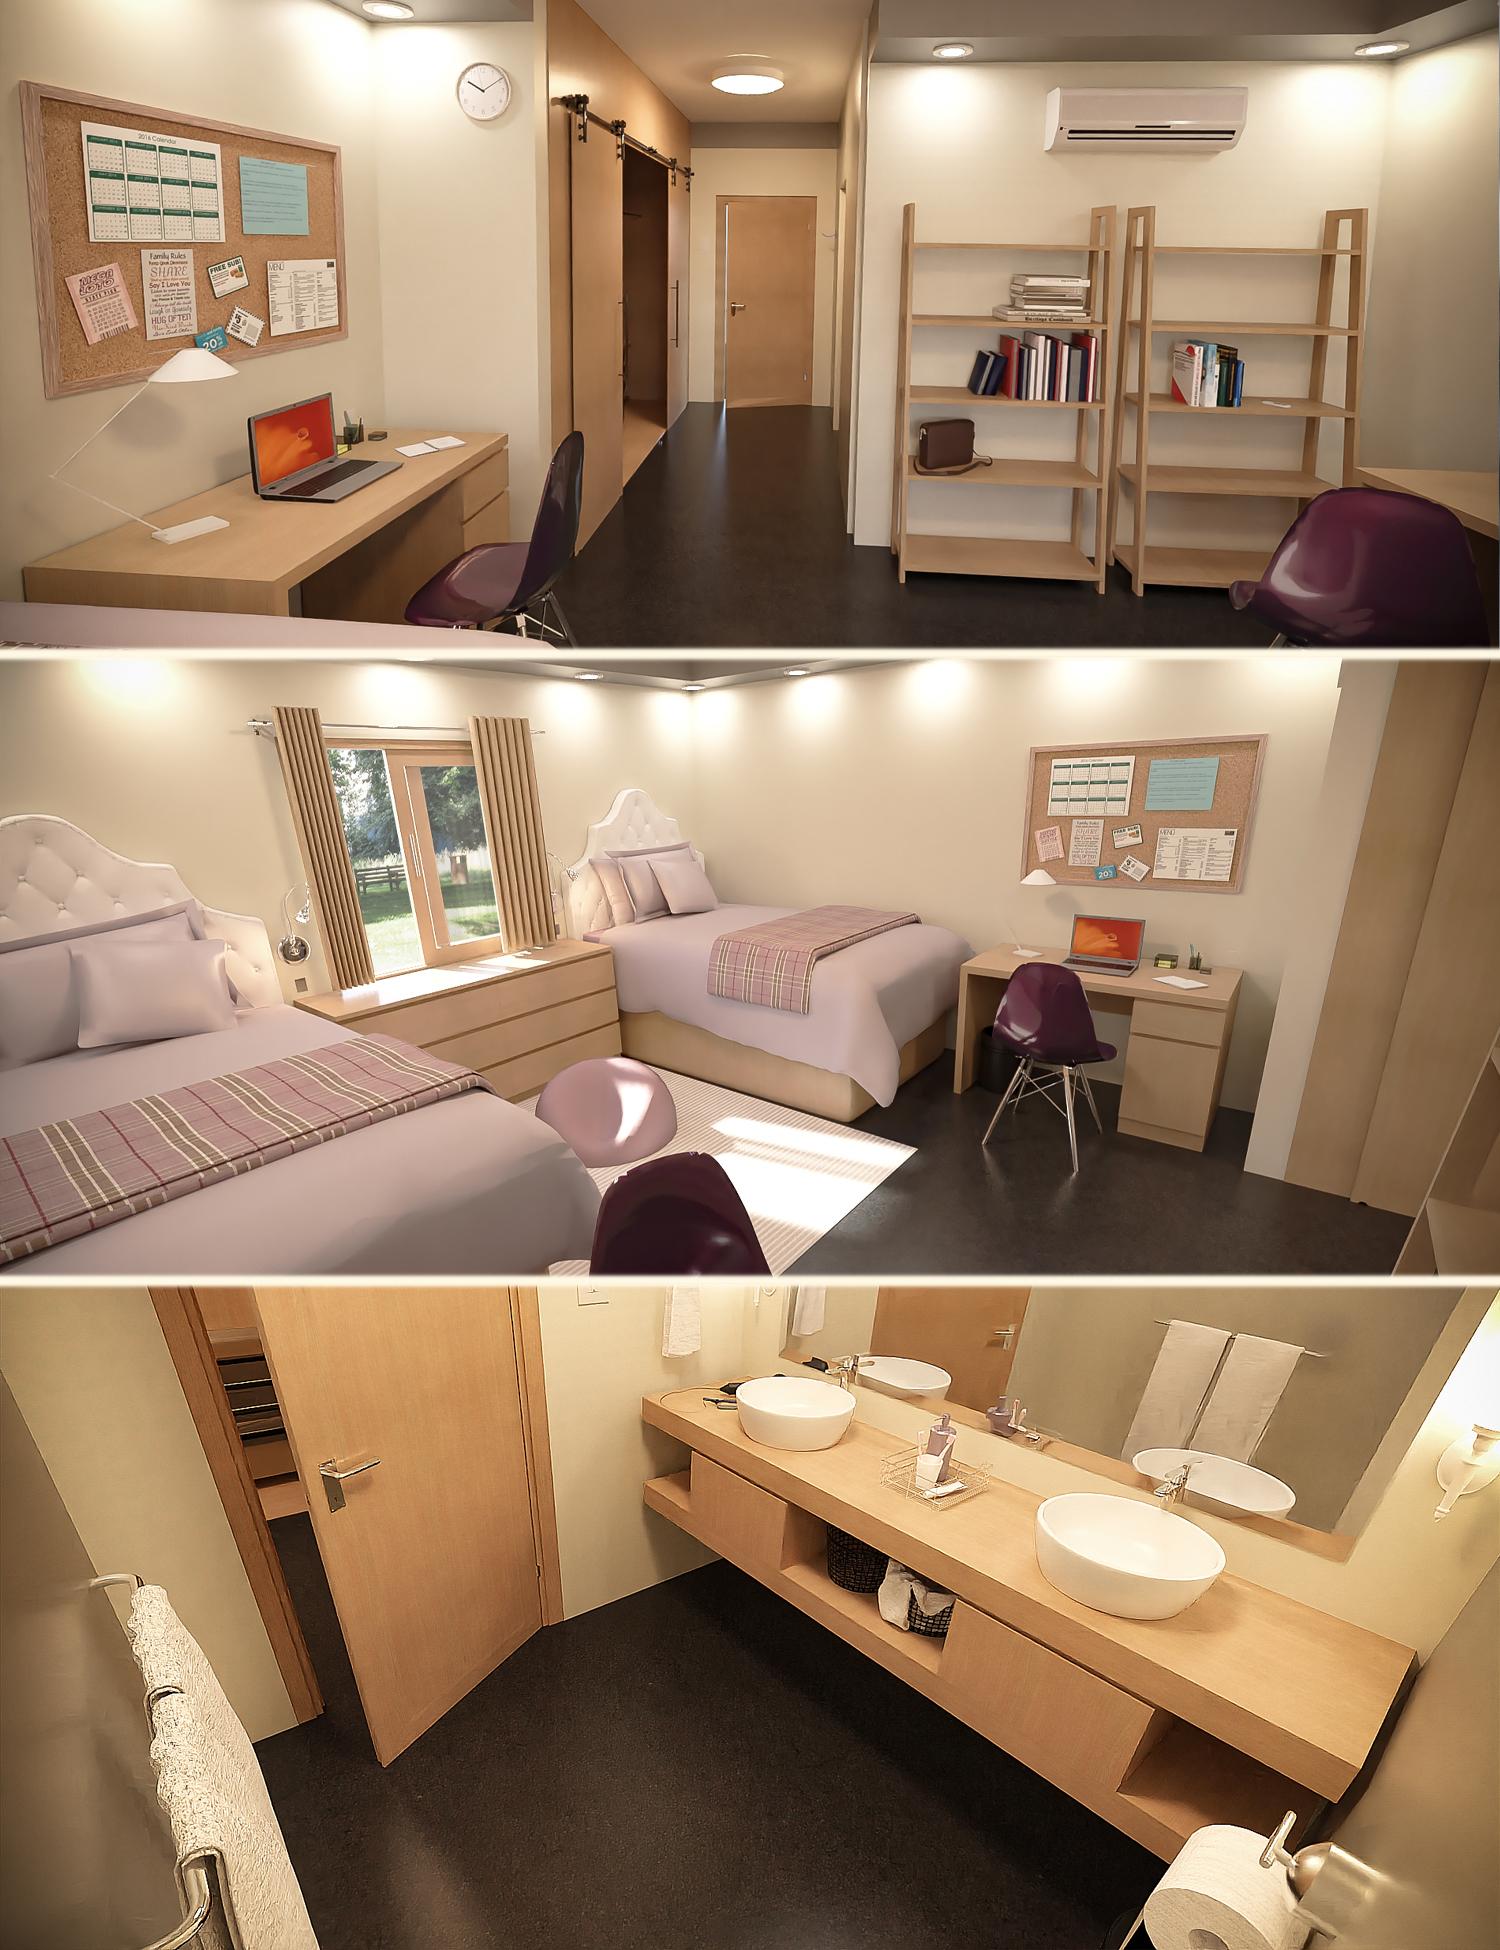 Girls Dorm Room by: Tesla3dCorp, 3D Models by Daz 3D